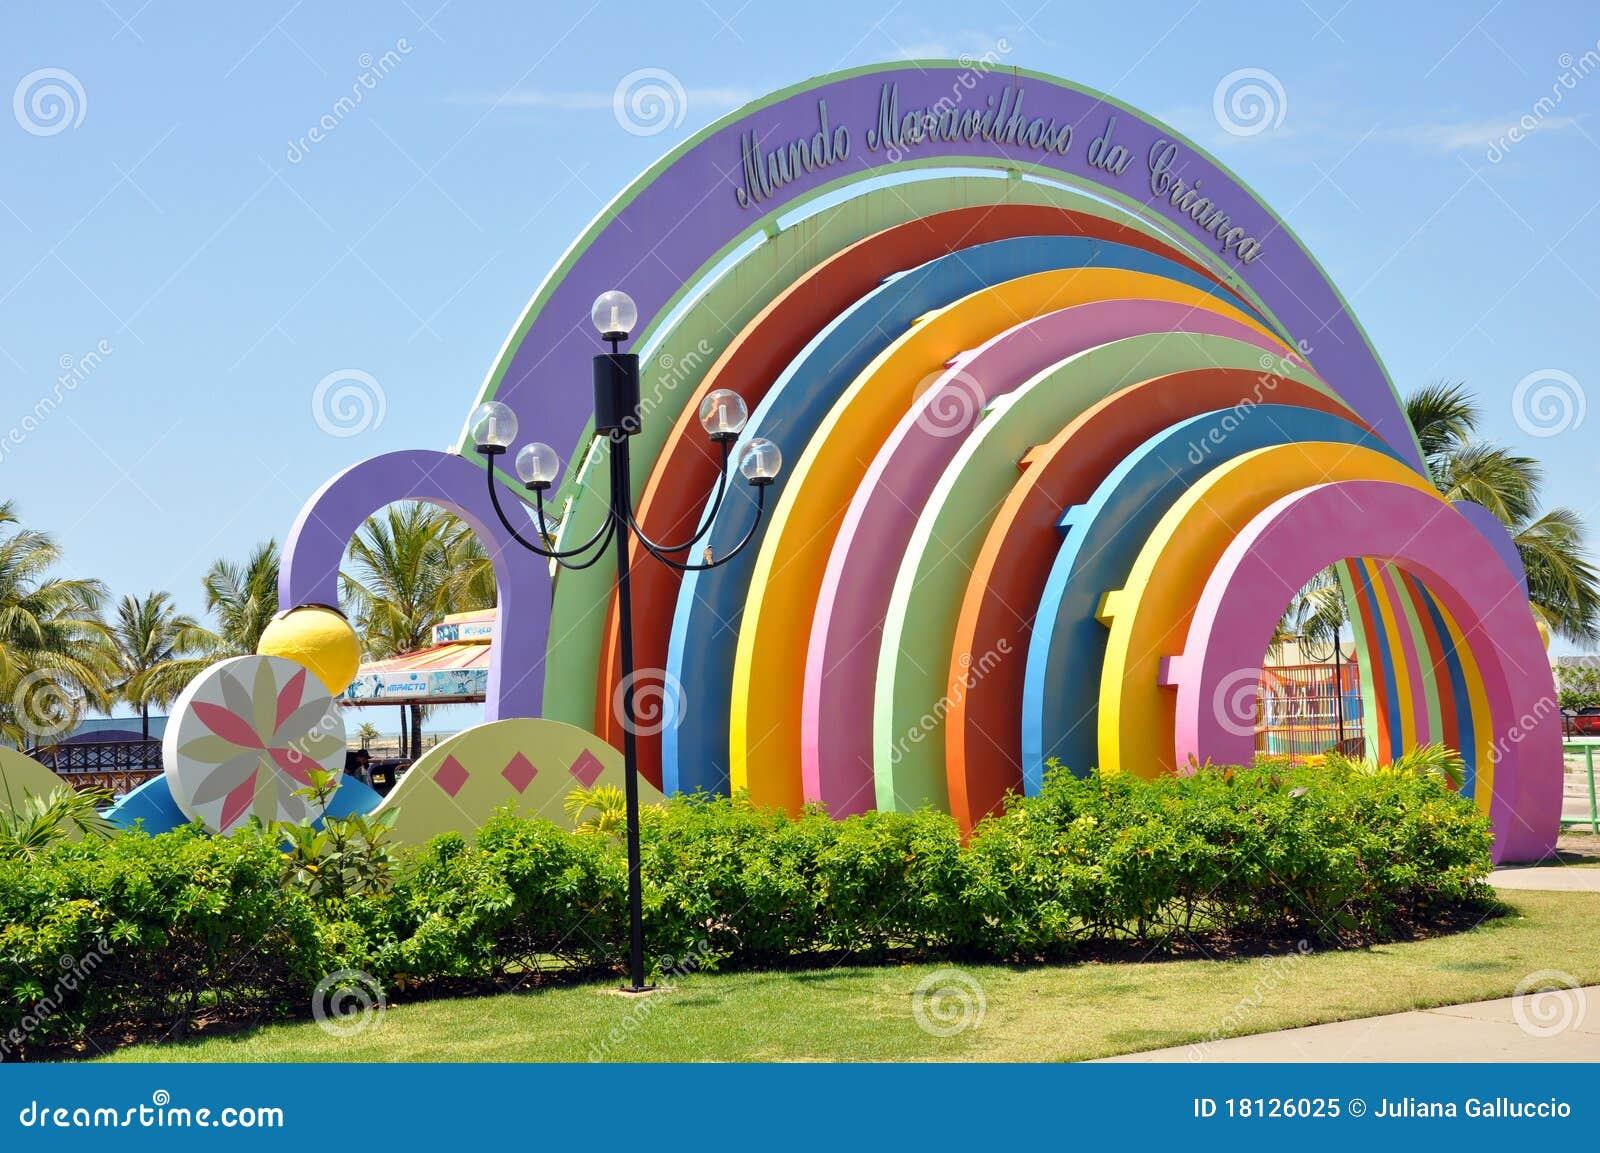 Stationnement public Mundo Maravilhoso DA Criança d Aracaju